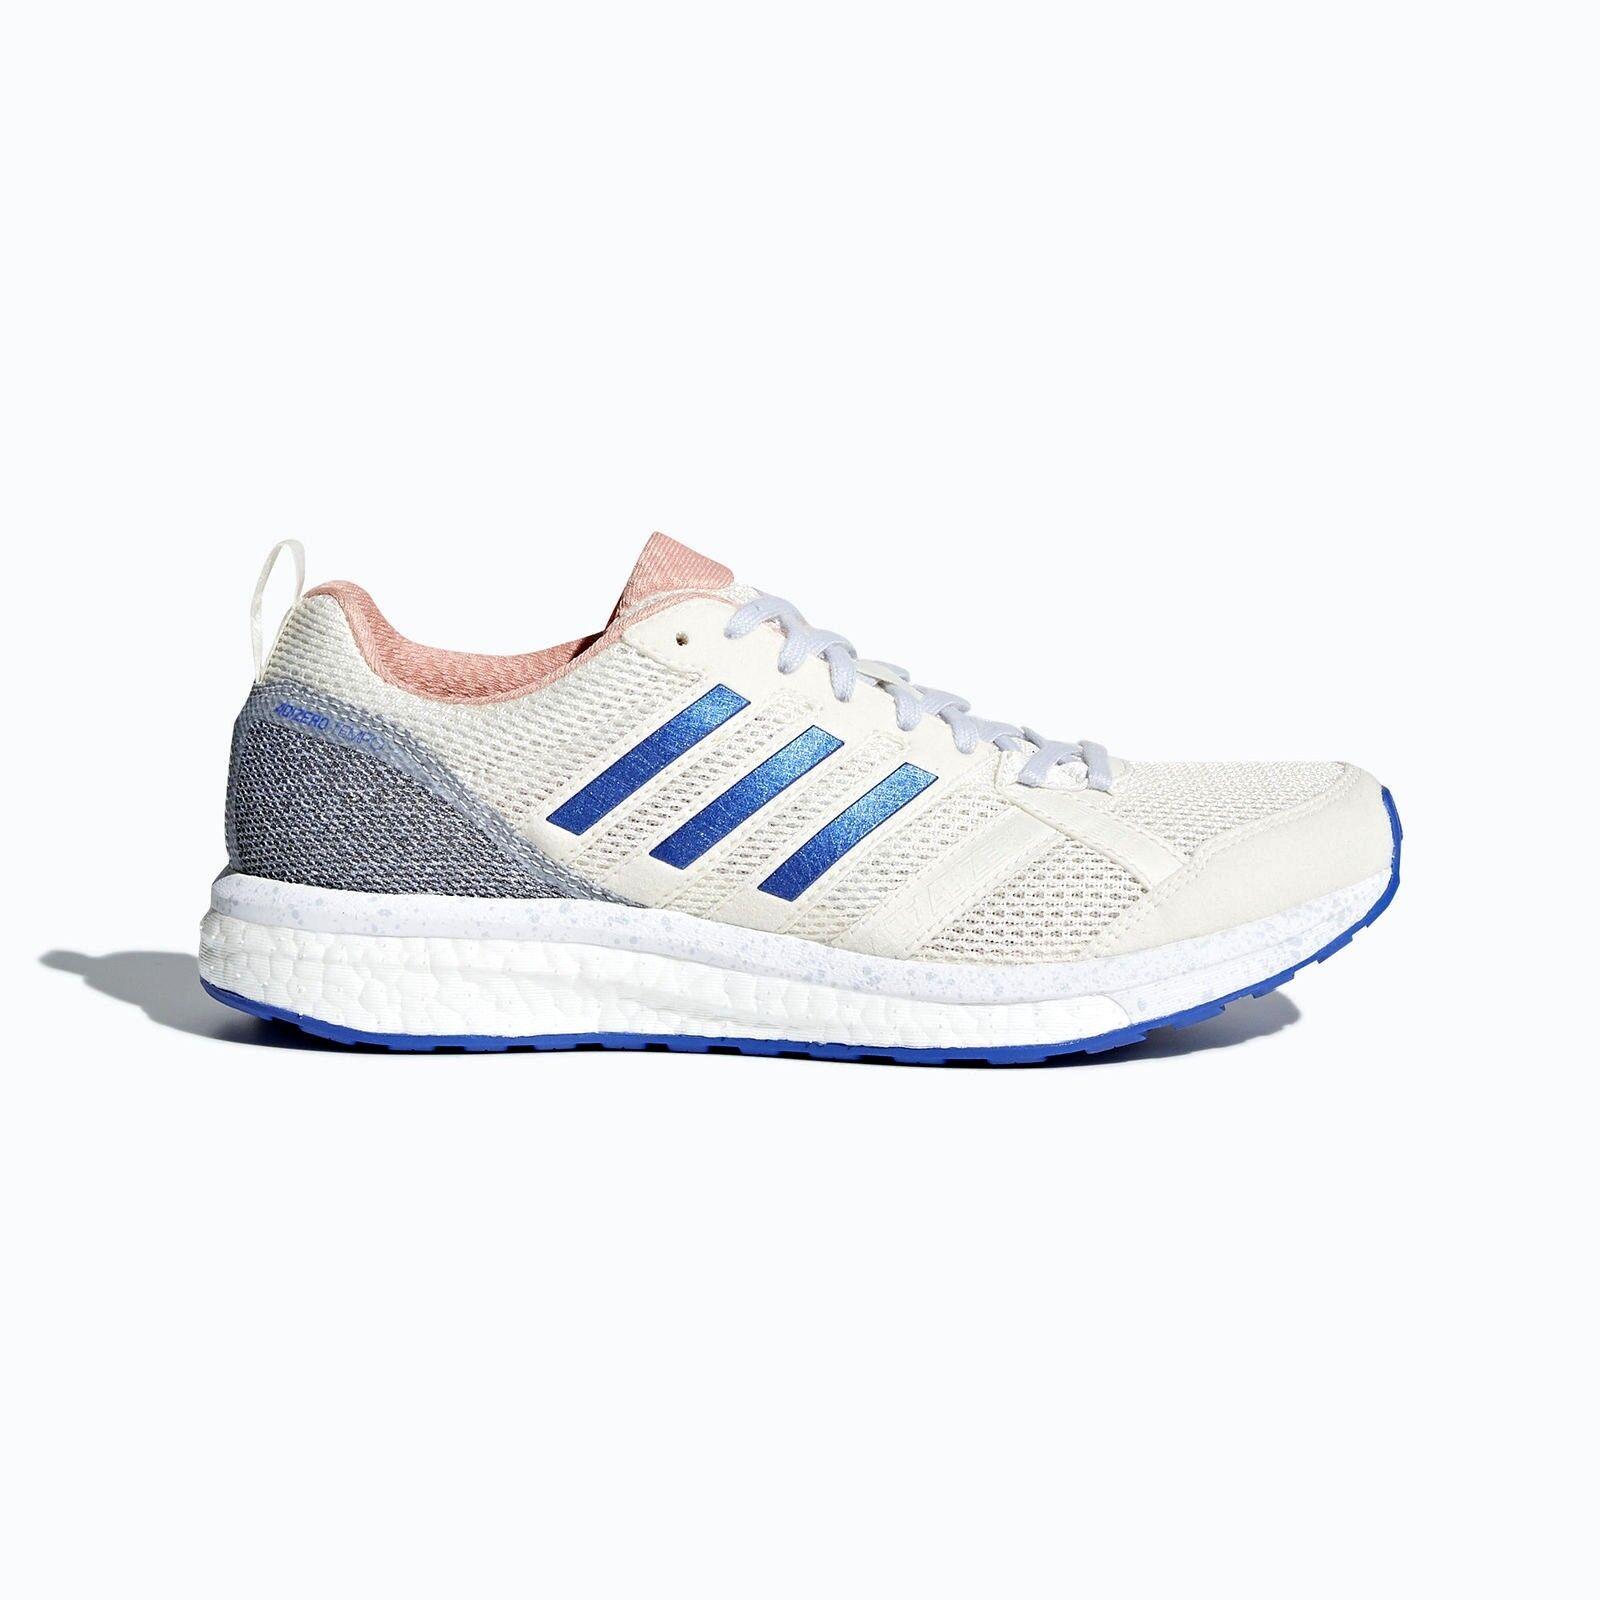 Adidas Adizero Tempo 9 White/Aero Shoes Blue CP9498 Womens Running Shoes White/Aero Size 8 46a4d0